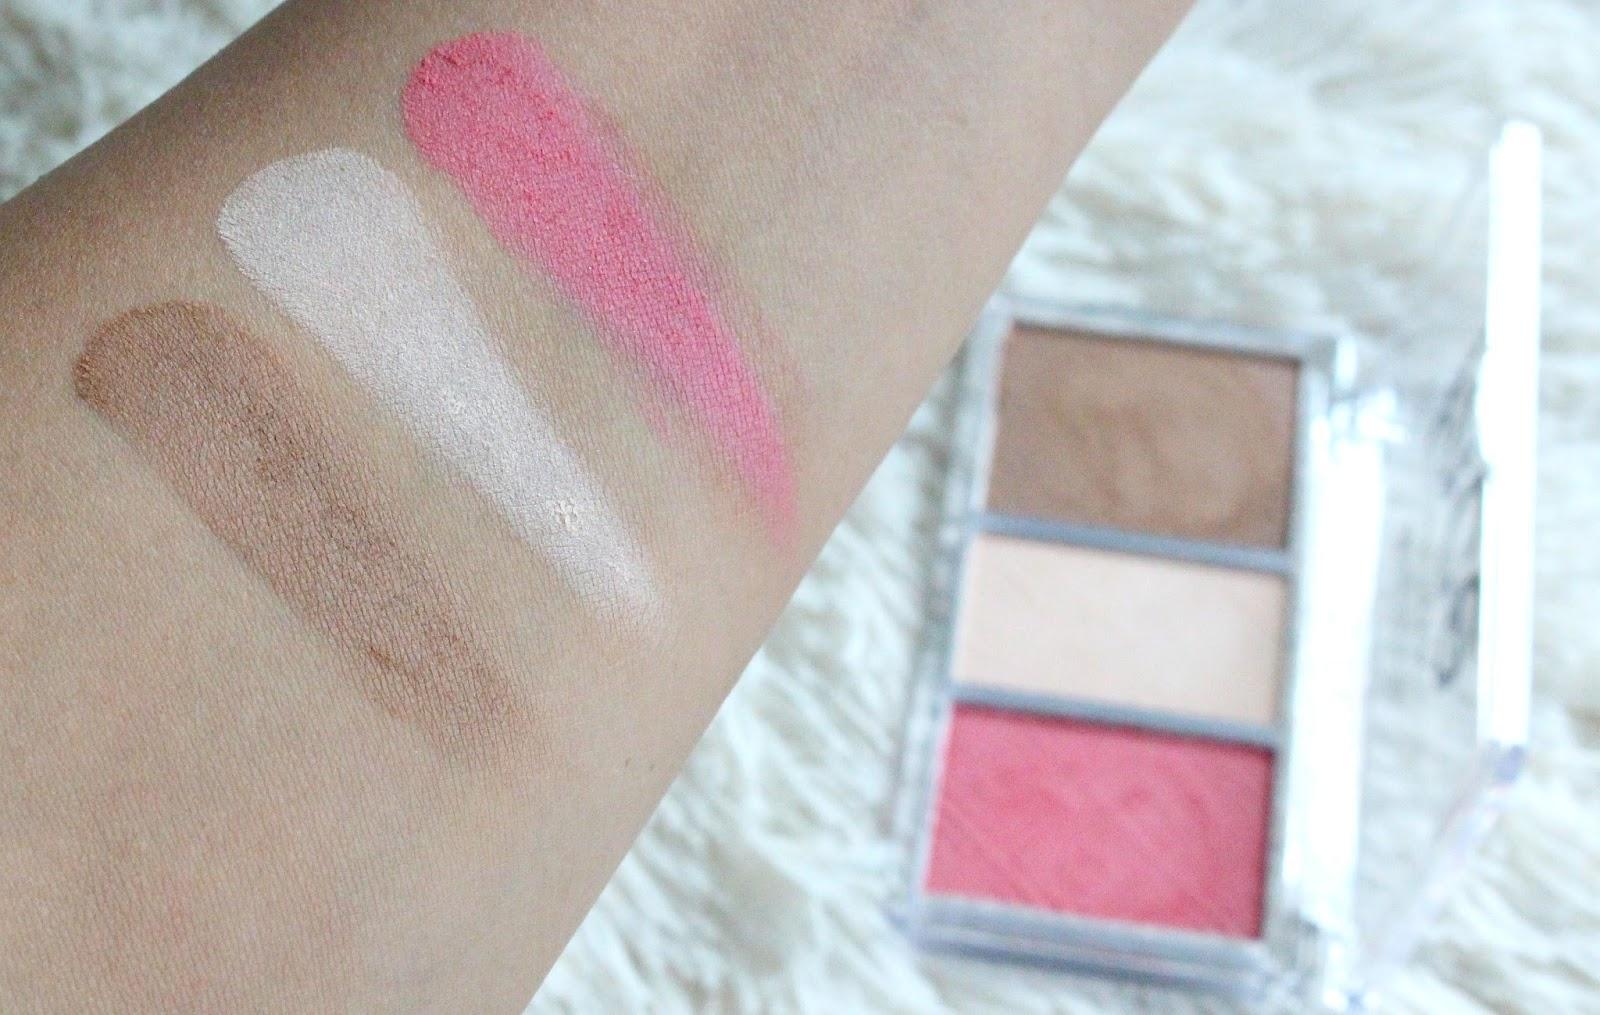 My Only 1 Lipstick Palette by essence #21